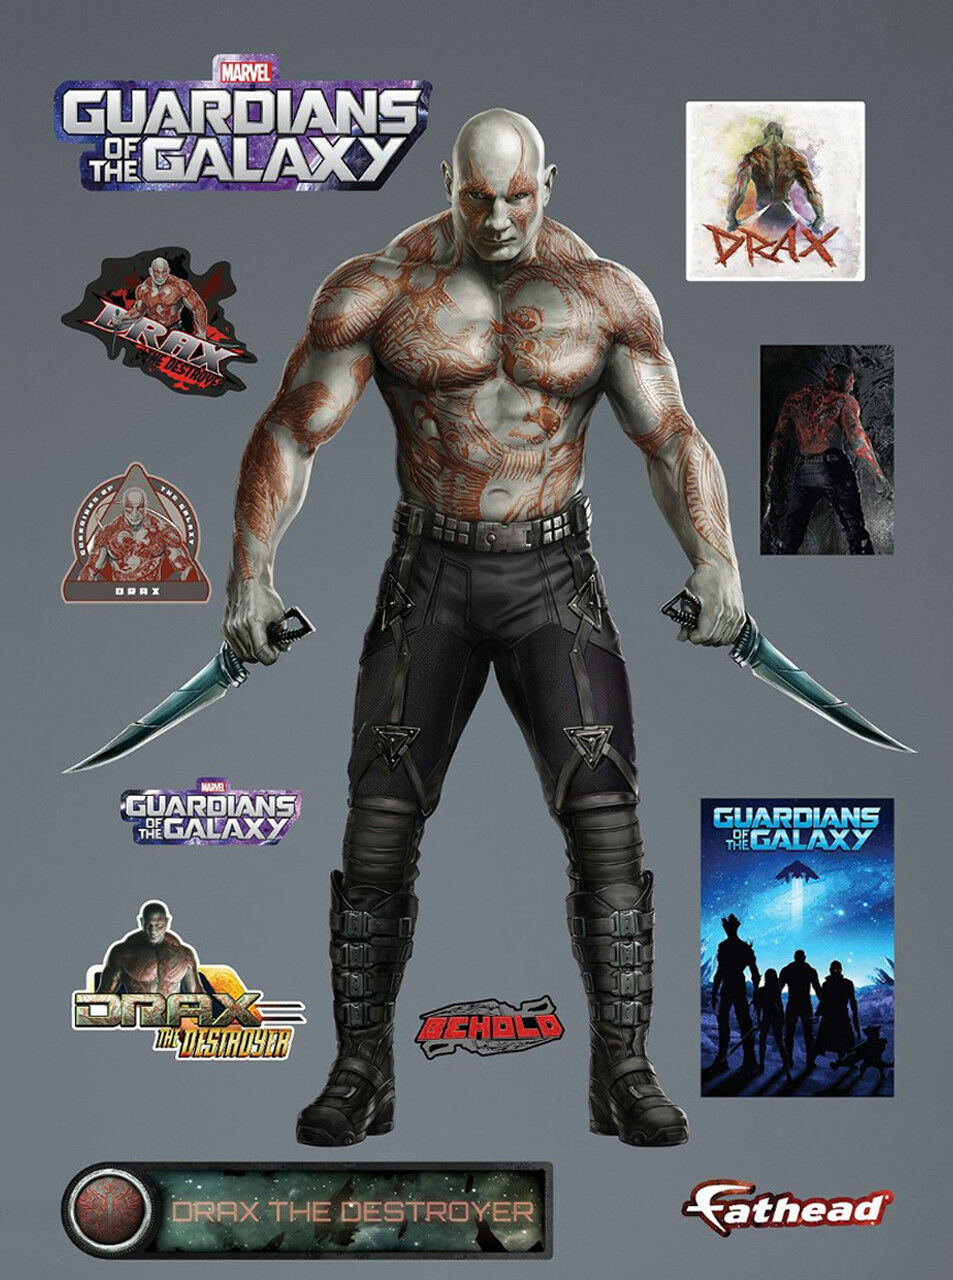 Fathead Drax Guardian of the Galaxy Marvel Comics Big Applique Murale 96-96097